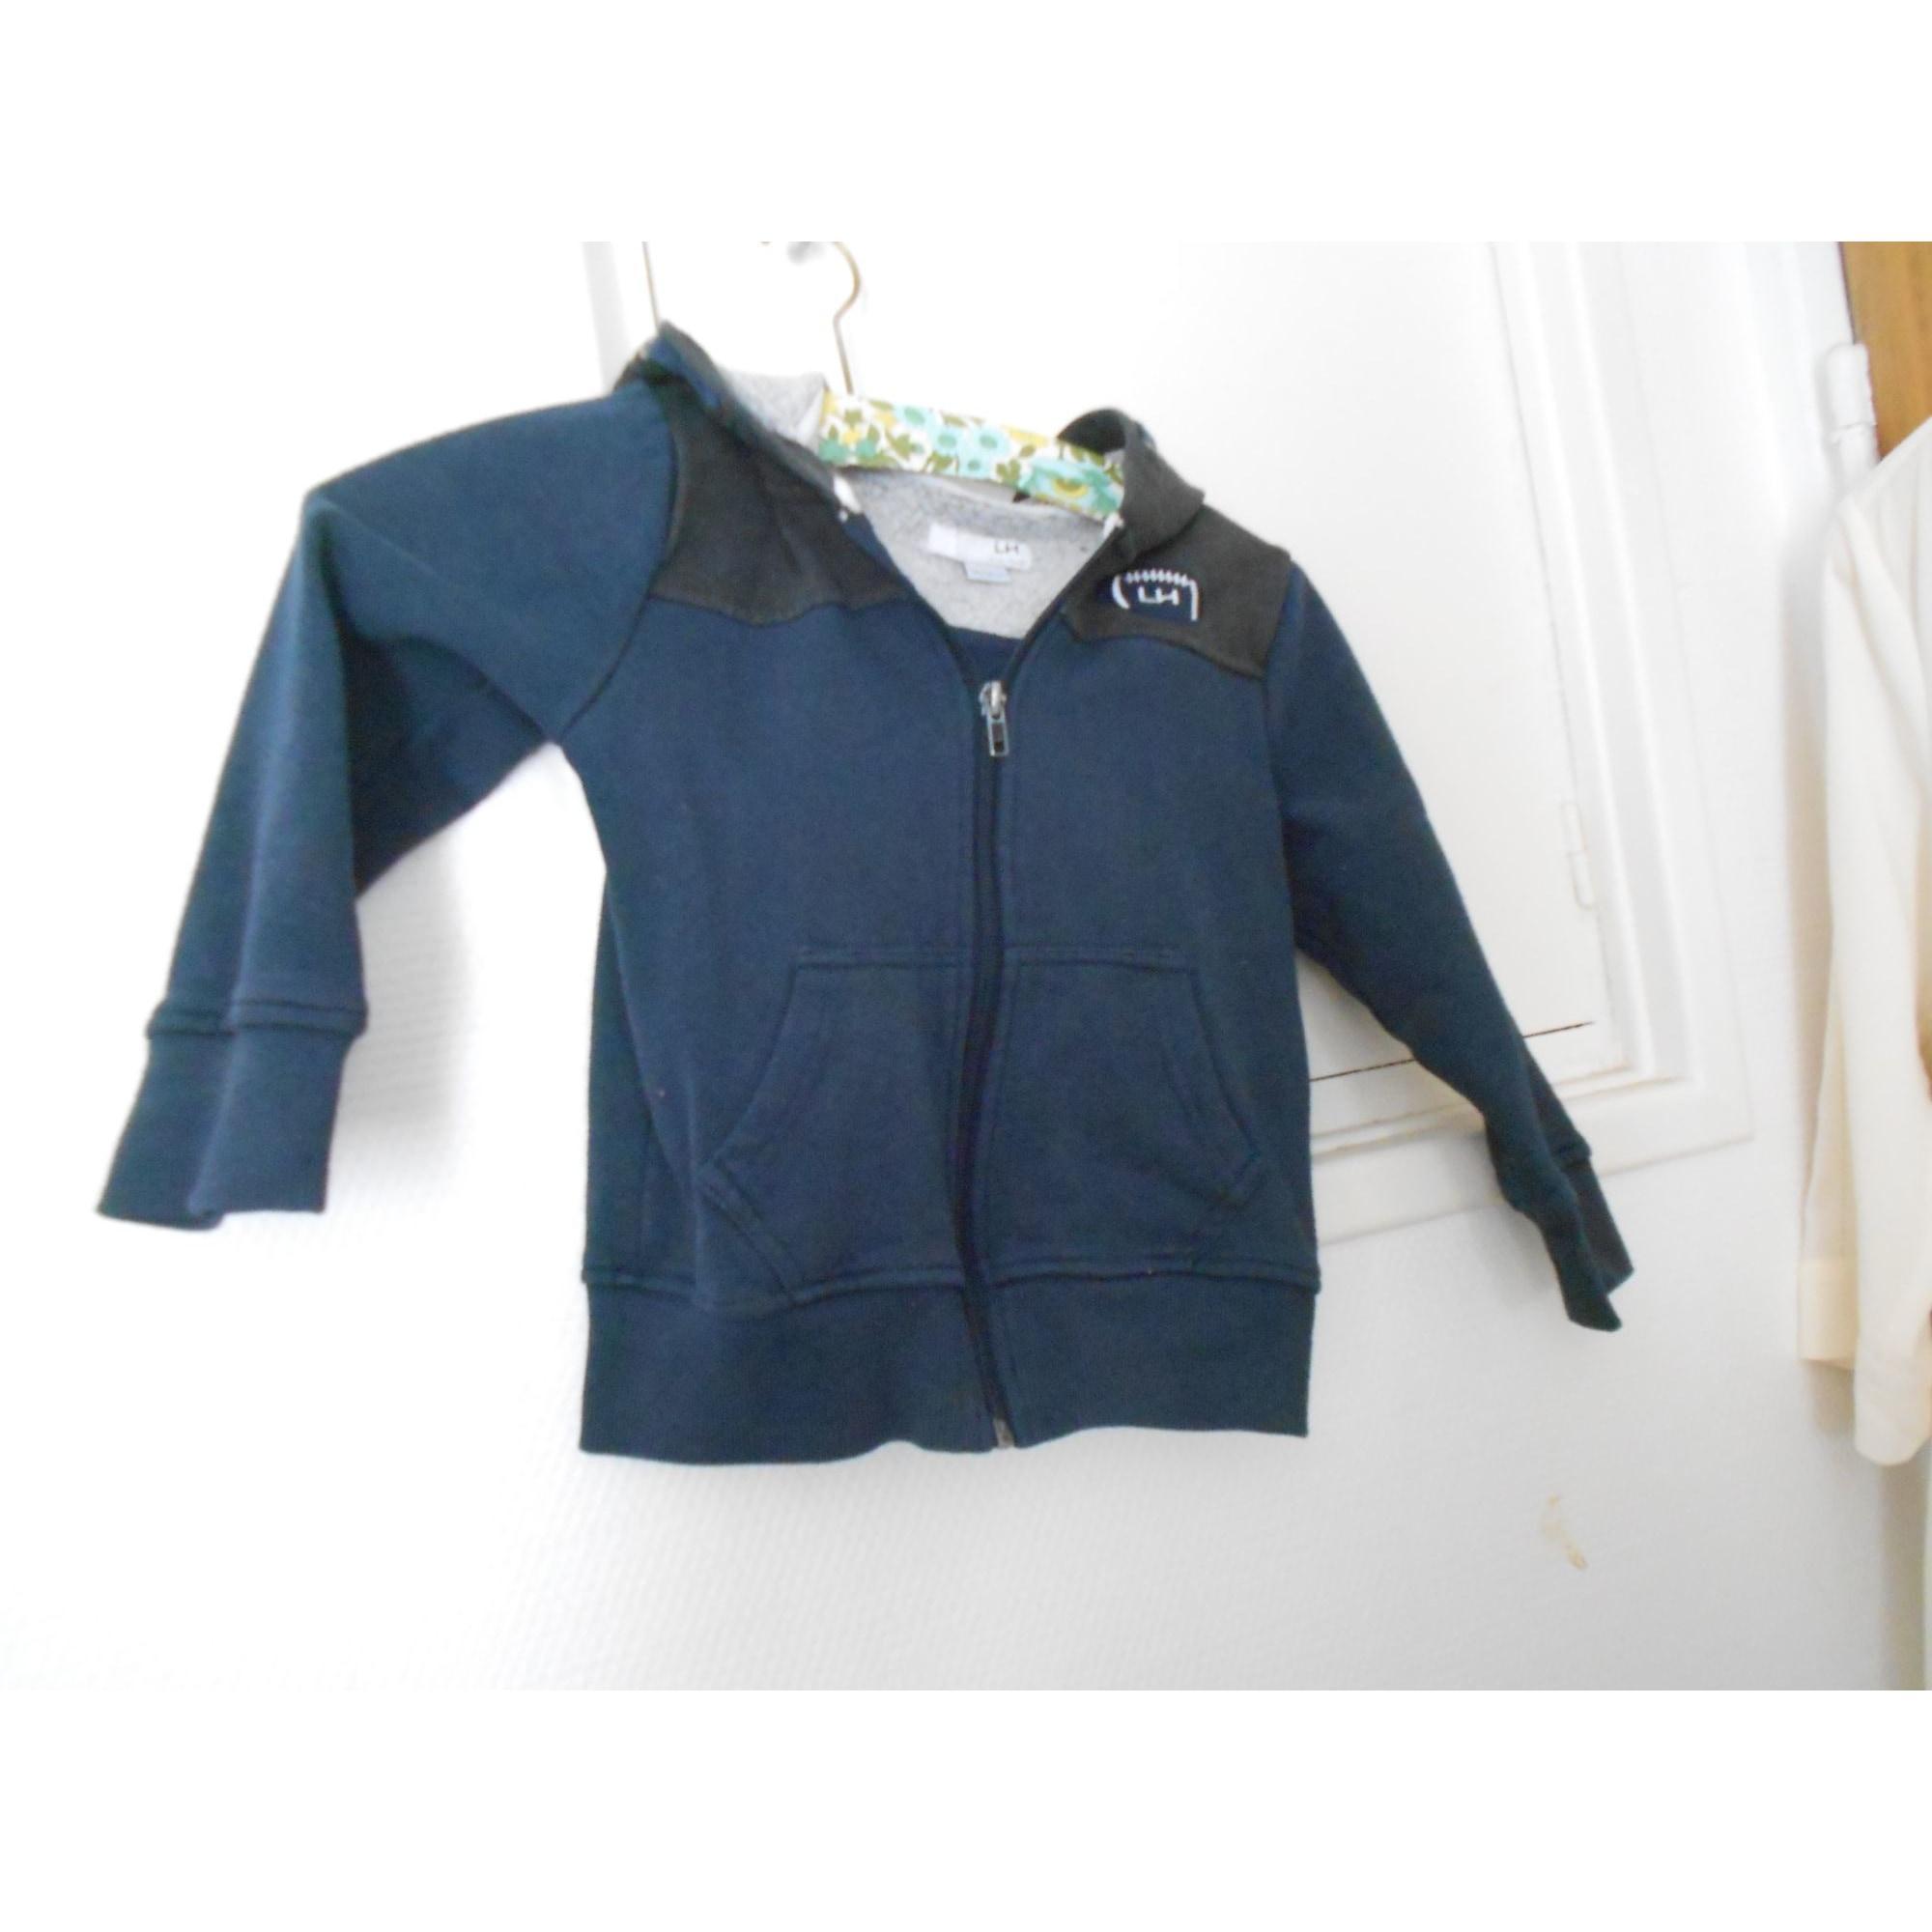 Sweat LA HALLE Bleu, bleu marine, bleu turquoise